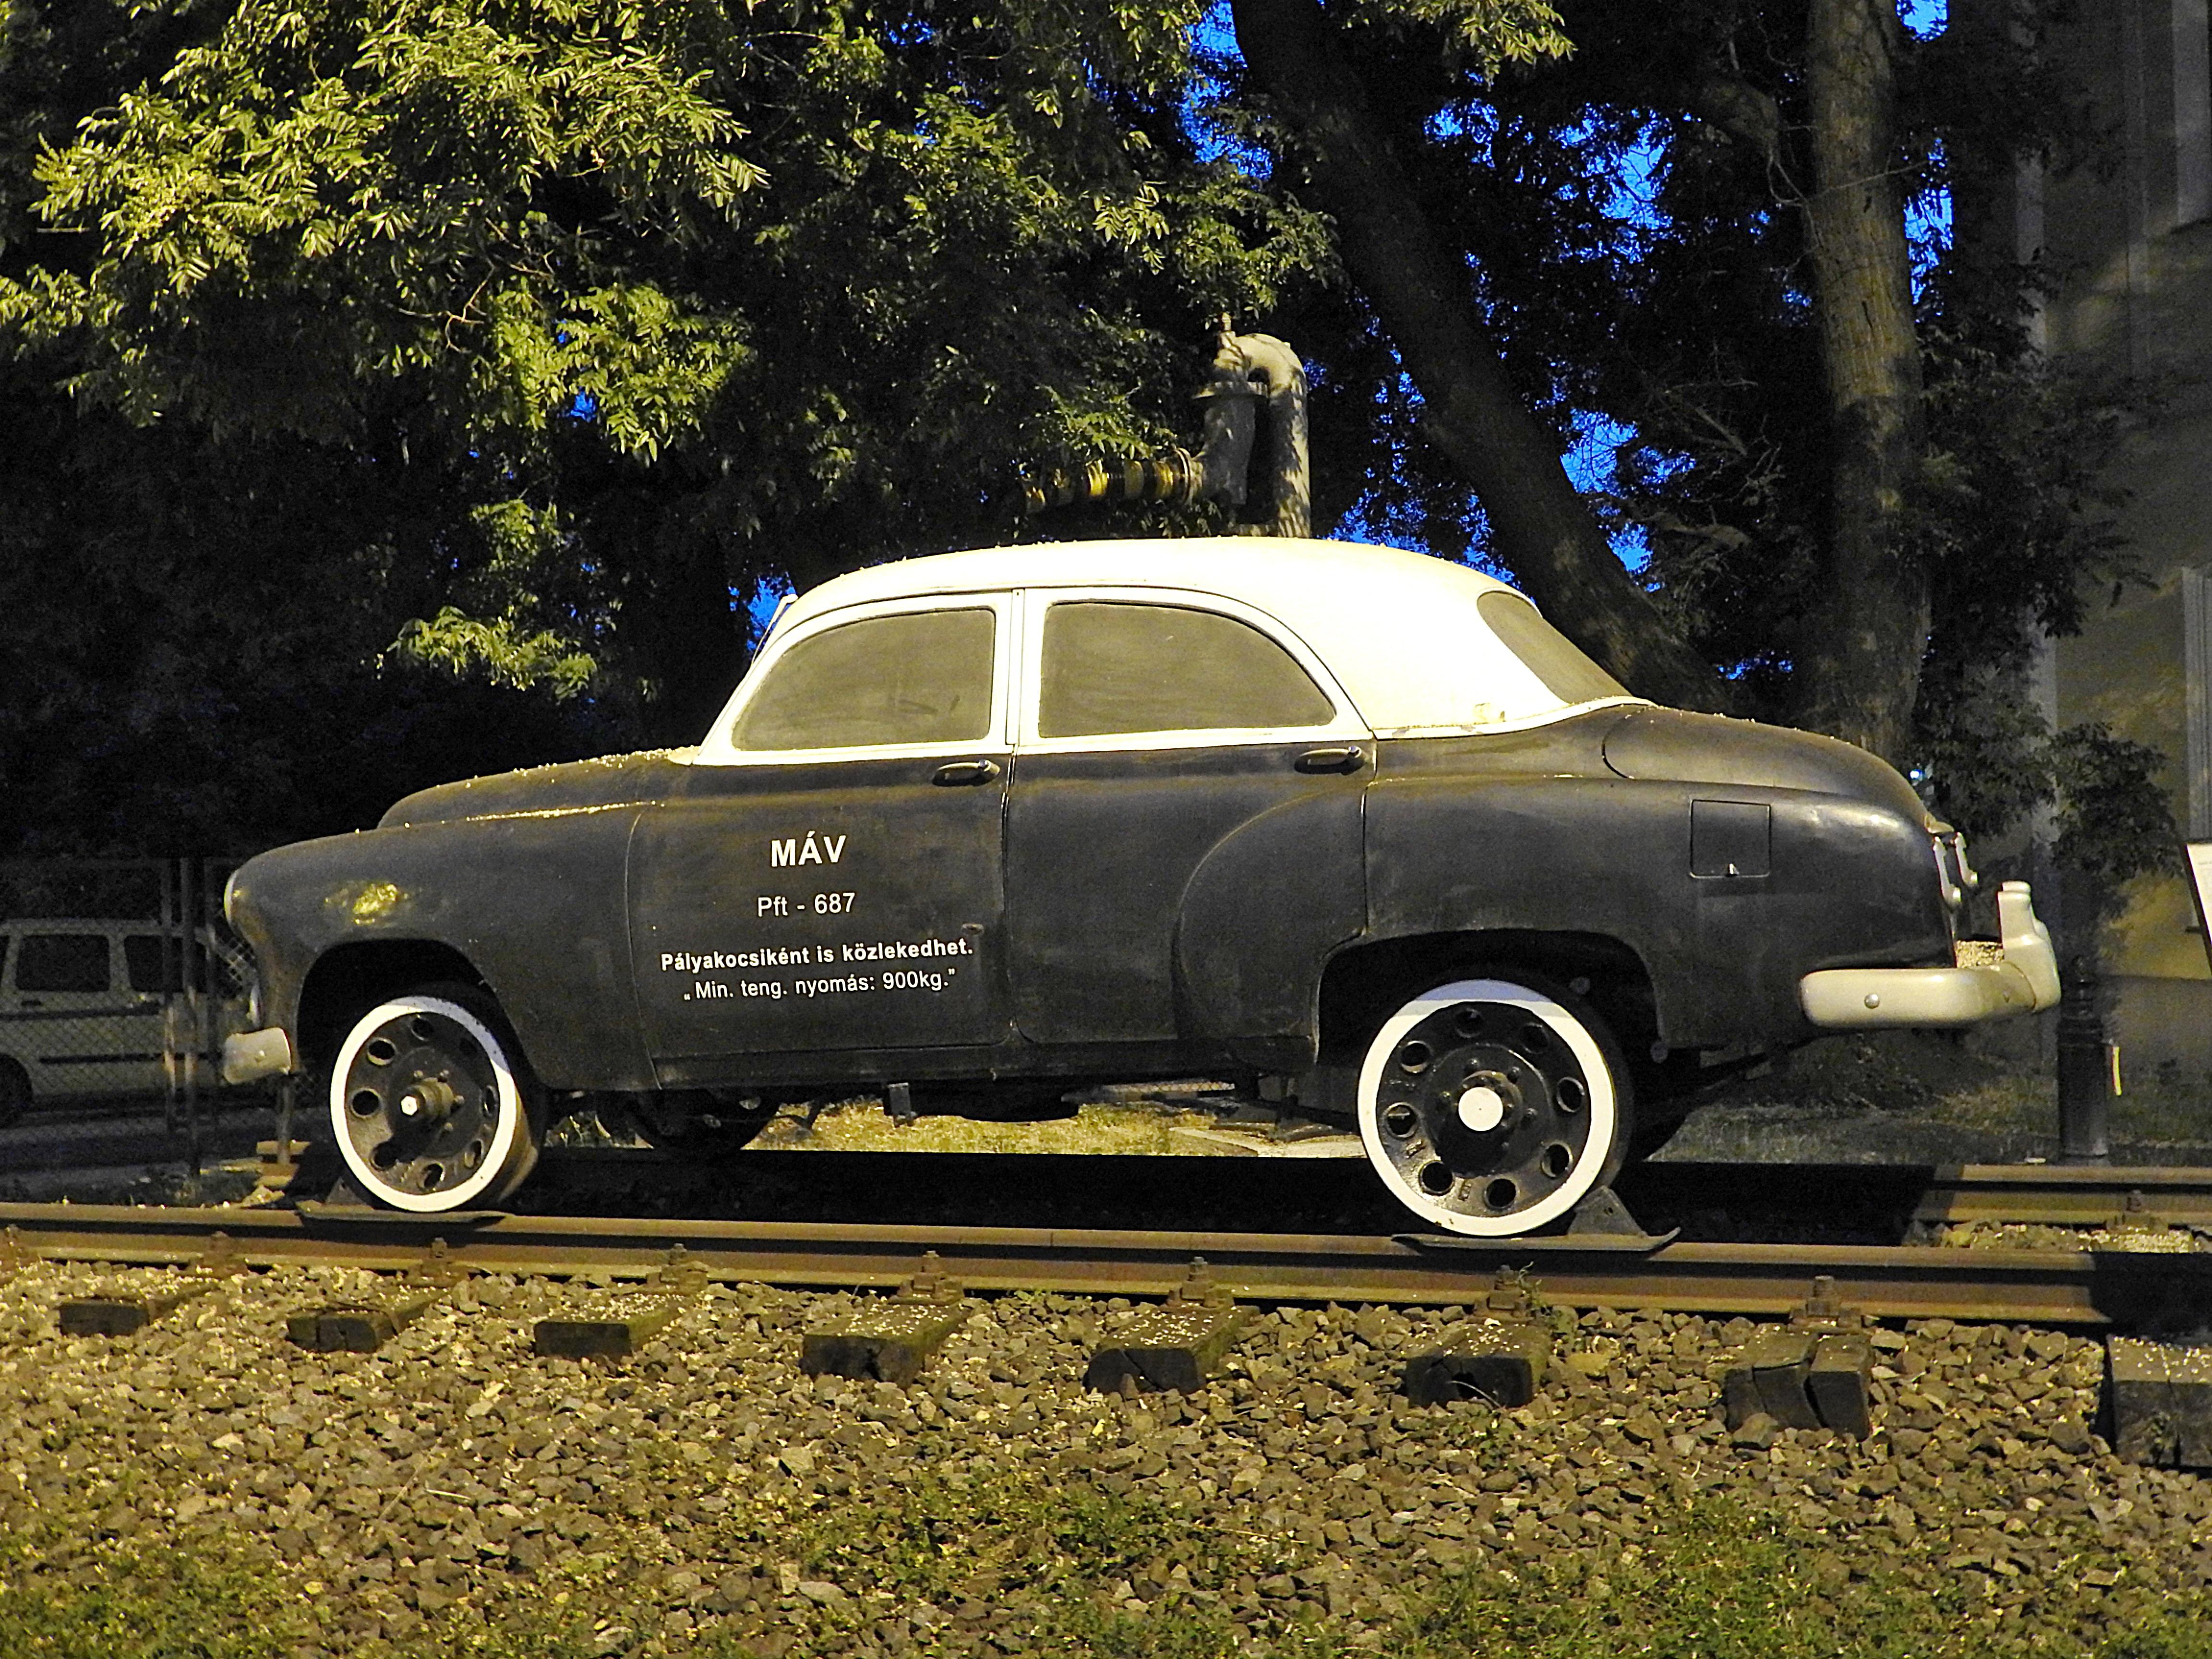 Free Images : auto, classic car, motor vehicle, vintage car, sedan ...